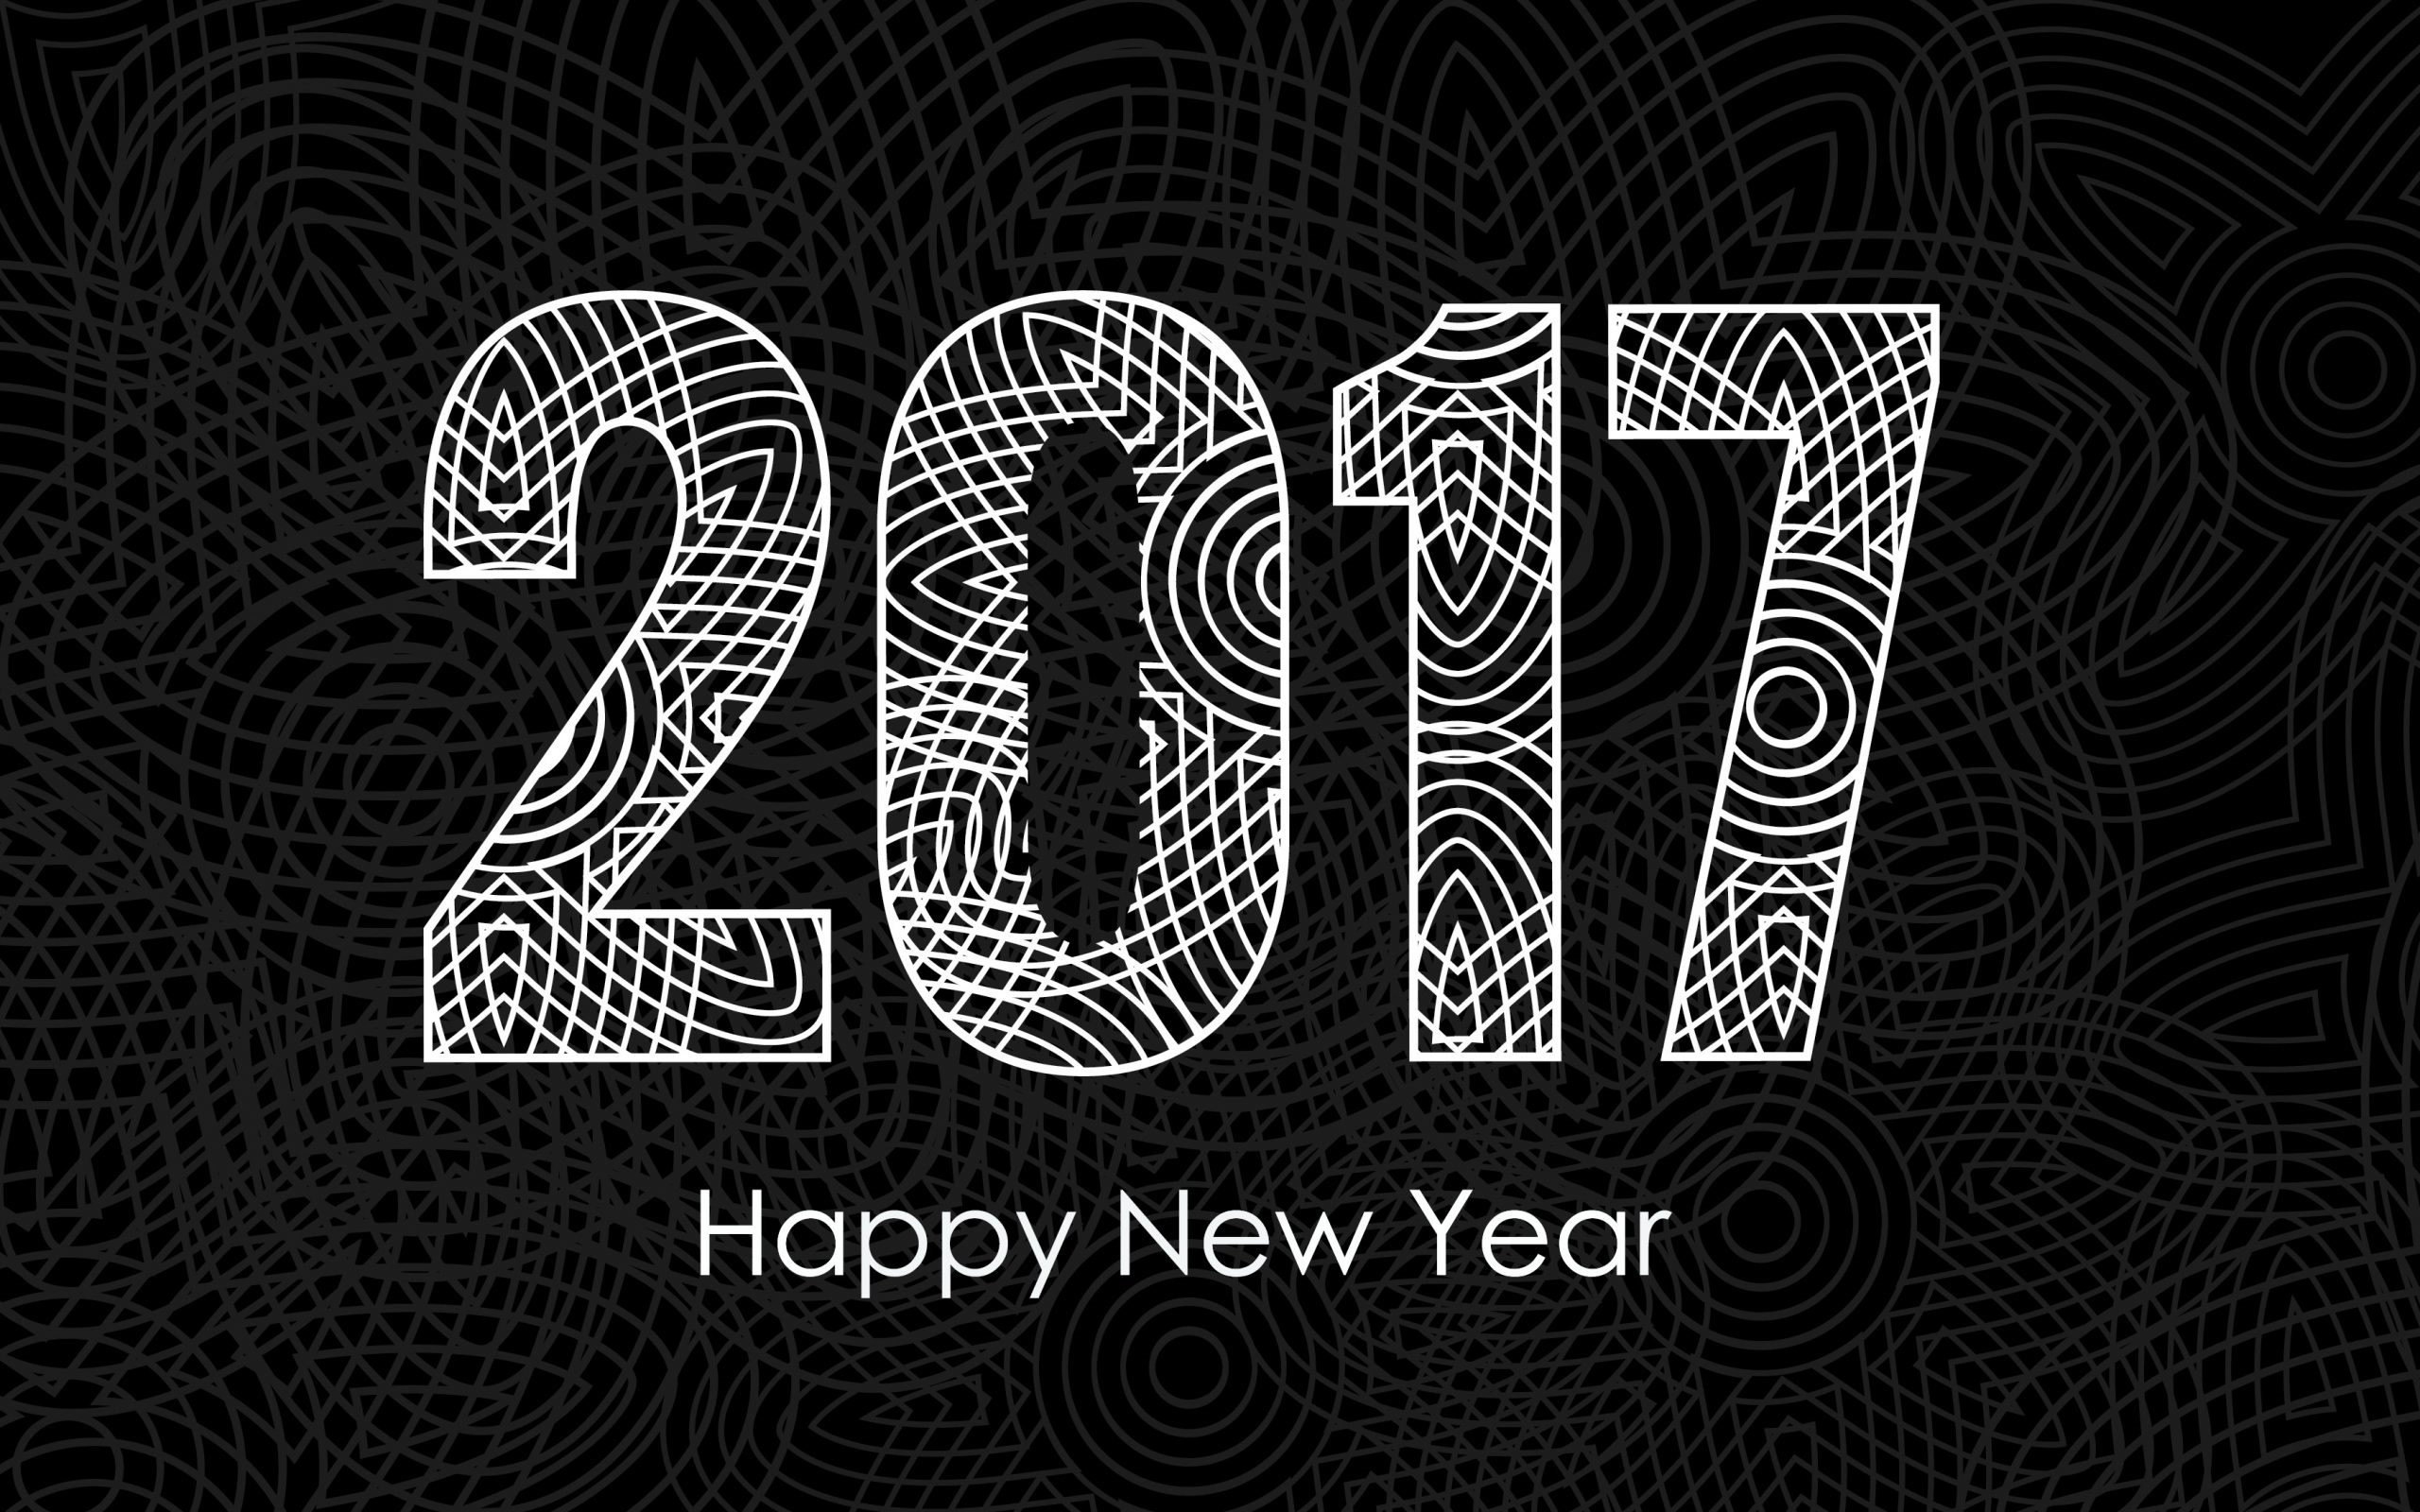 Celebrations / New Year / Happy New Year Wallpaper. Happy New Year, 2017, HD